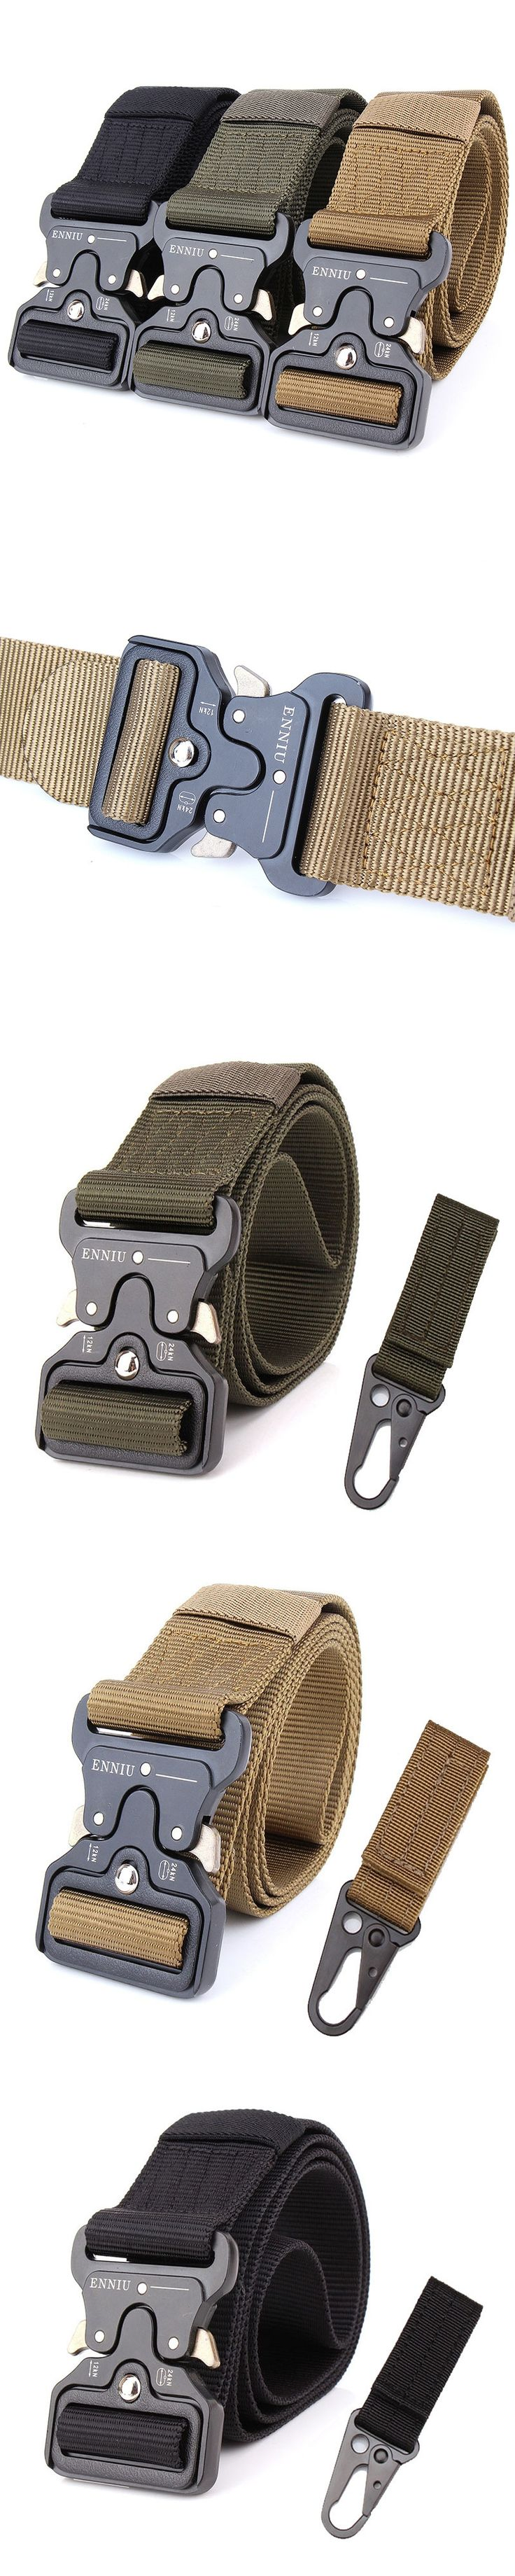 Tactical Belt Military Automatic Buckle Belt Survival Waistbelt Molle Nylon BelMens SWAT Police Army Combat Adjust Tactical Gear